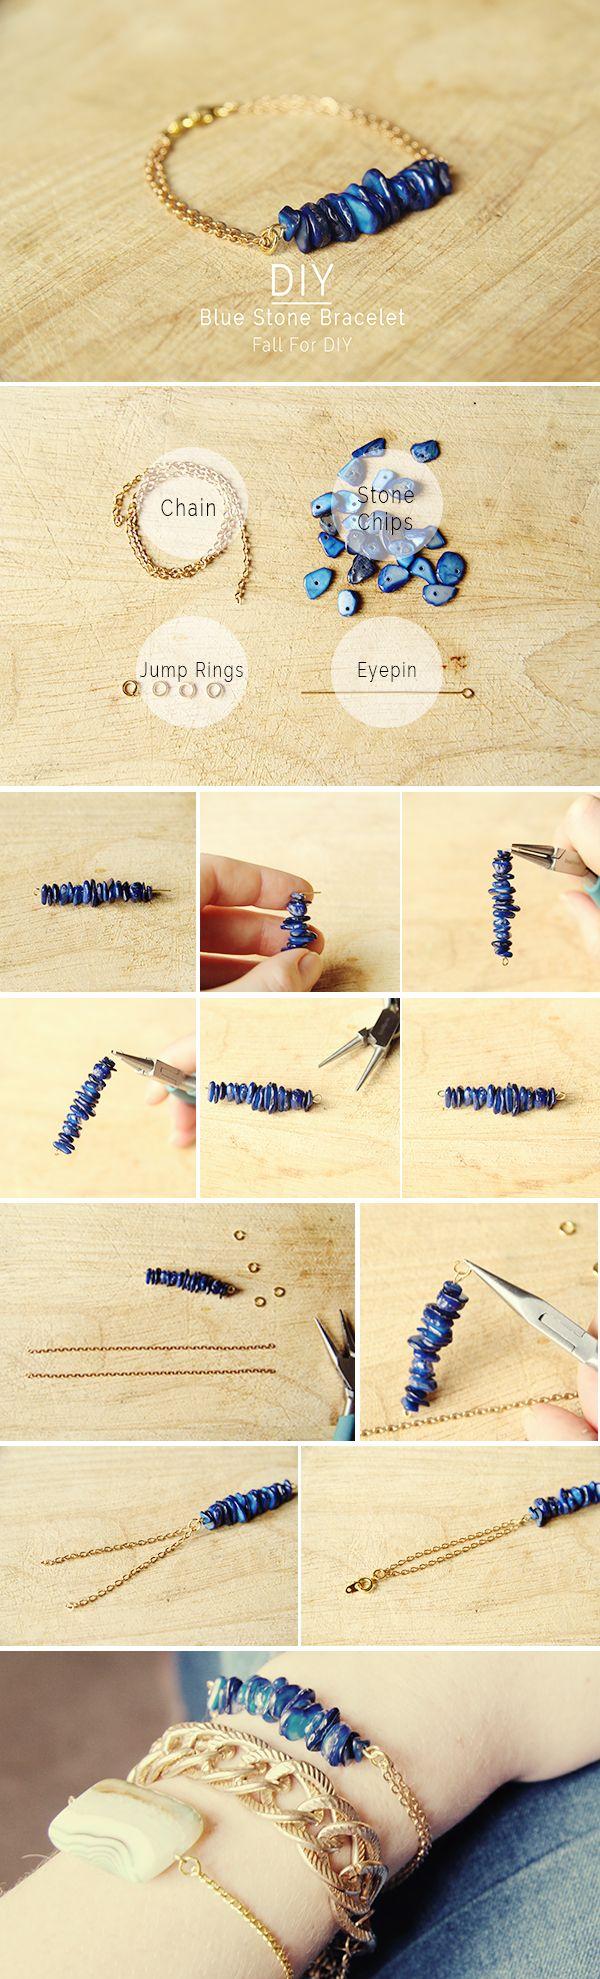 DIY: blue stone bracelet